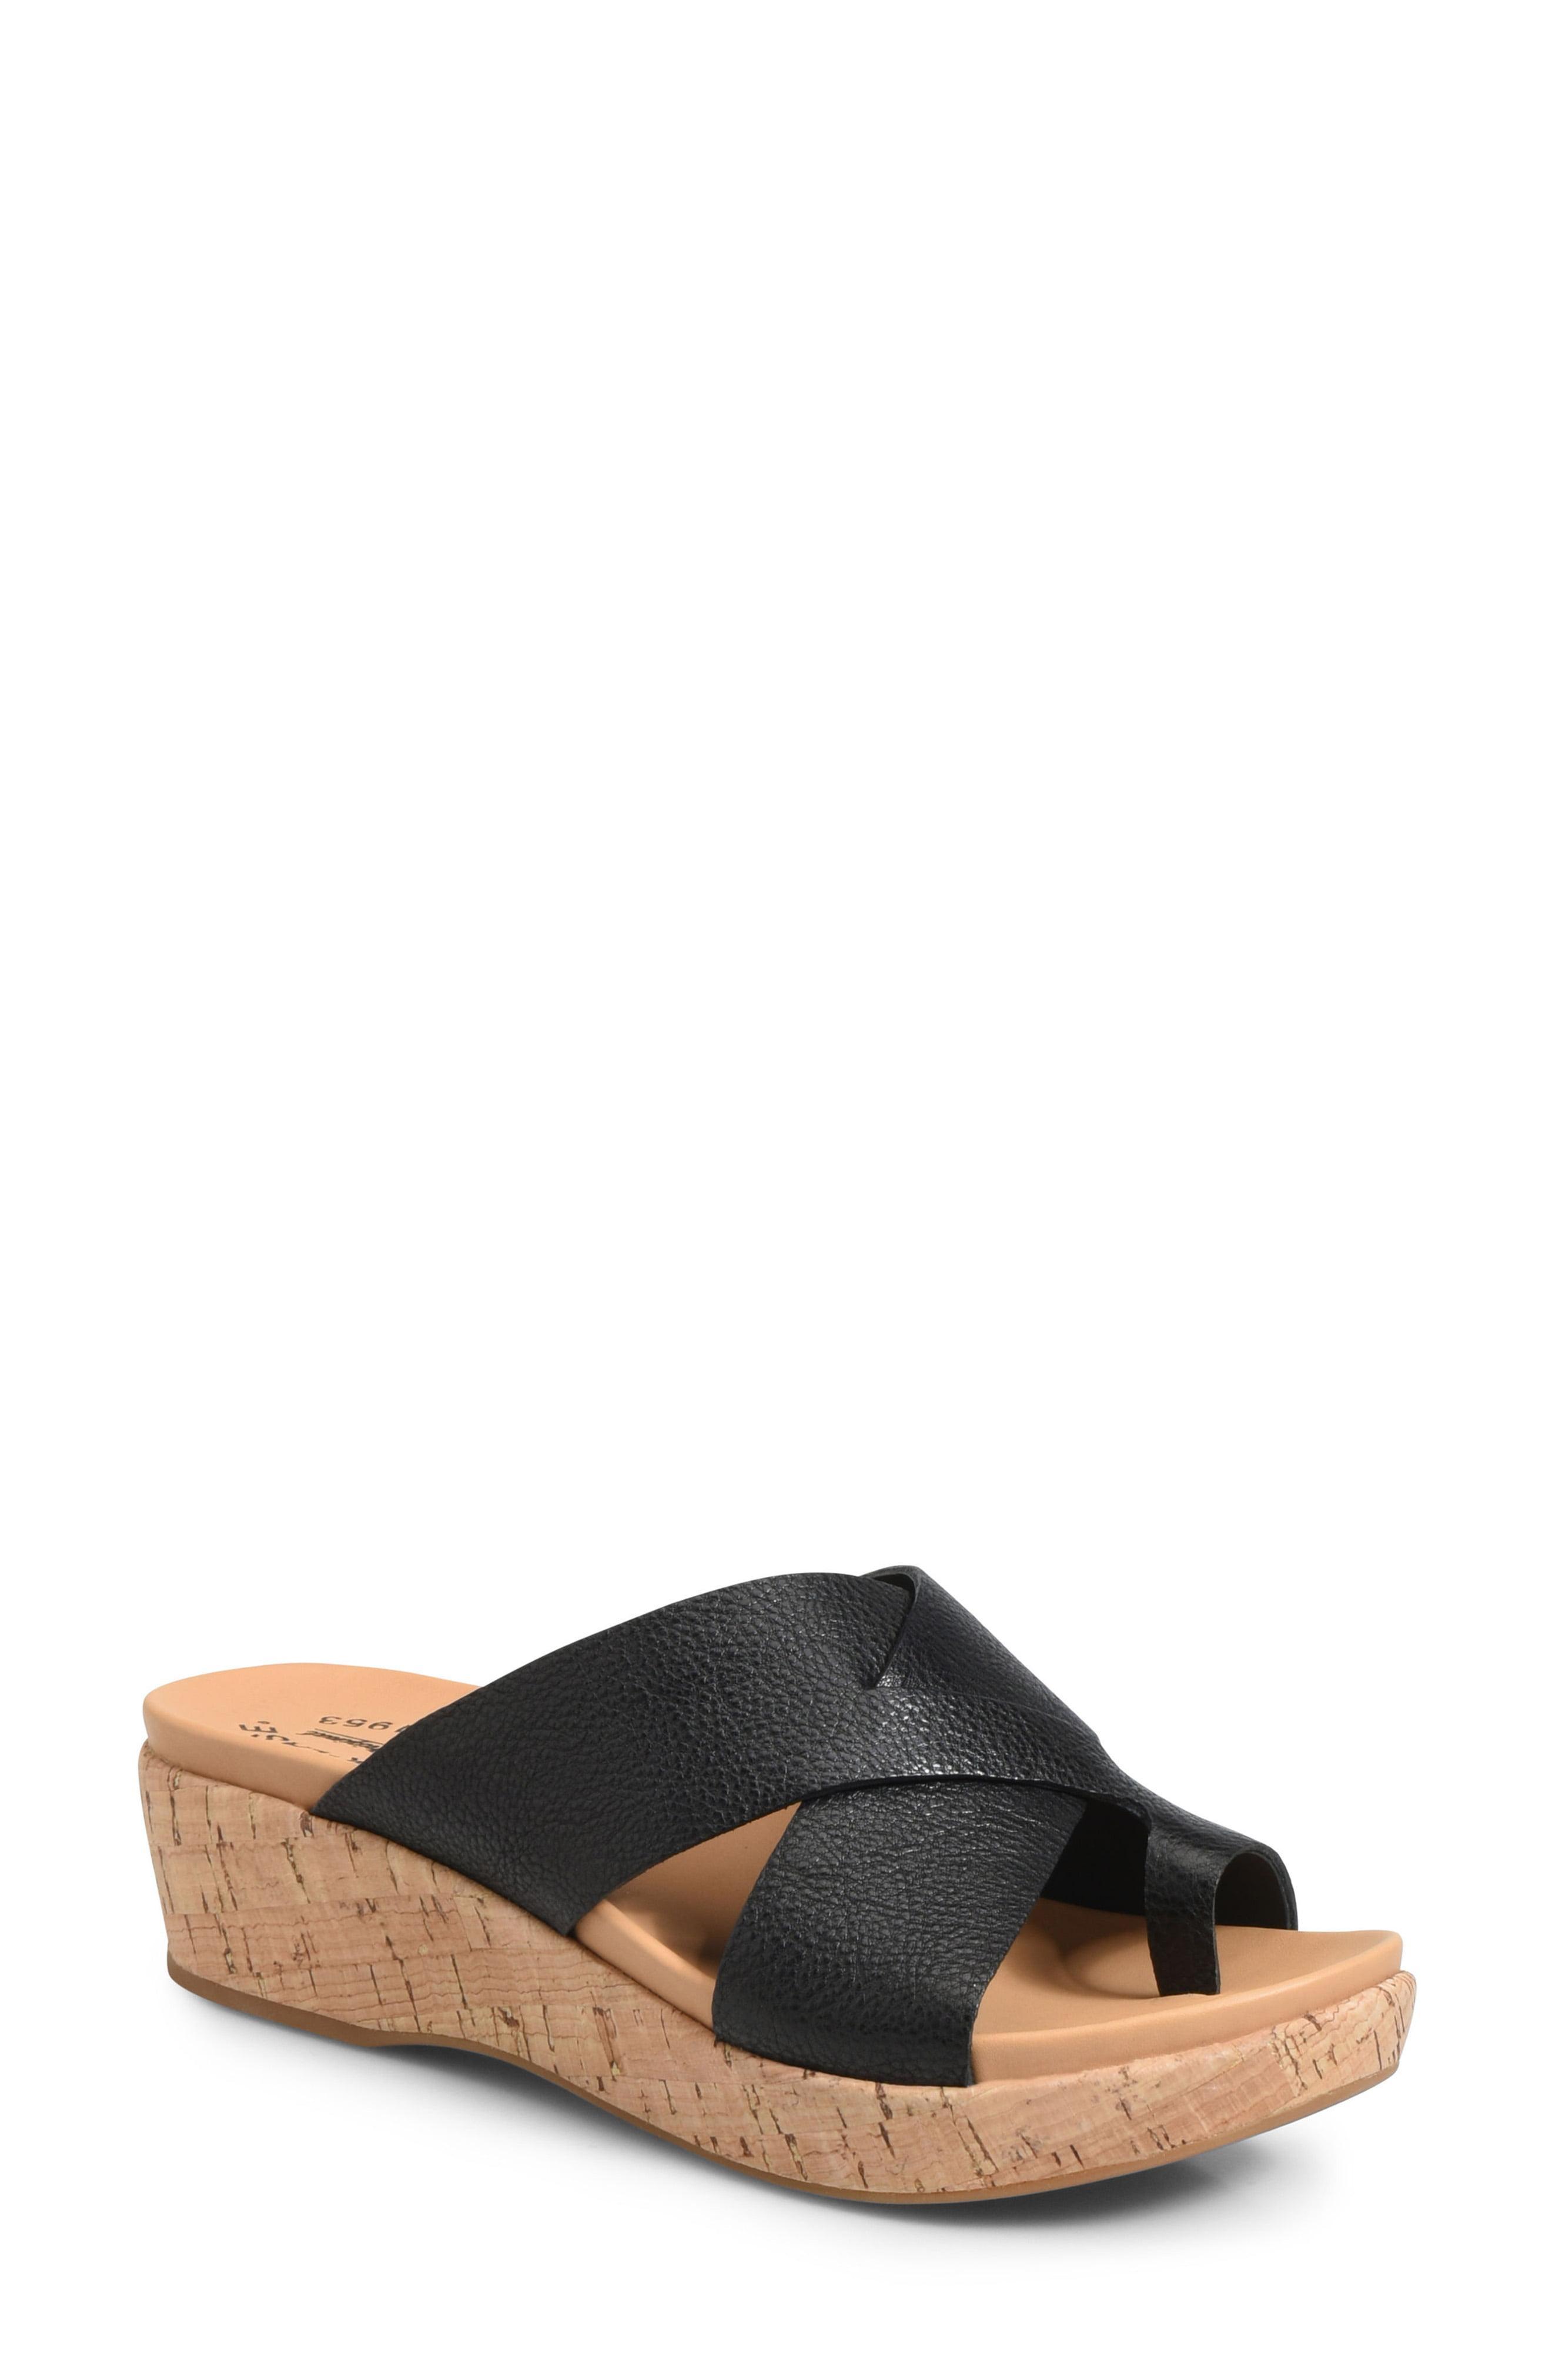 96027aa930ad Lyst - Kork-Ease Kork-ease Baja Wedge Slide Sandal in Black - Save 29%